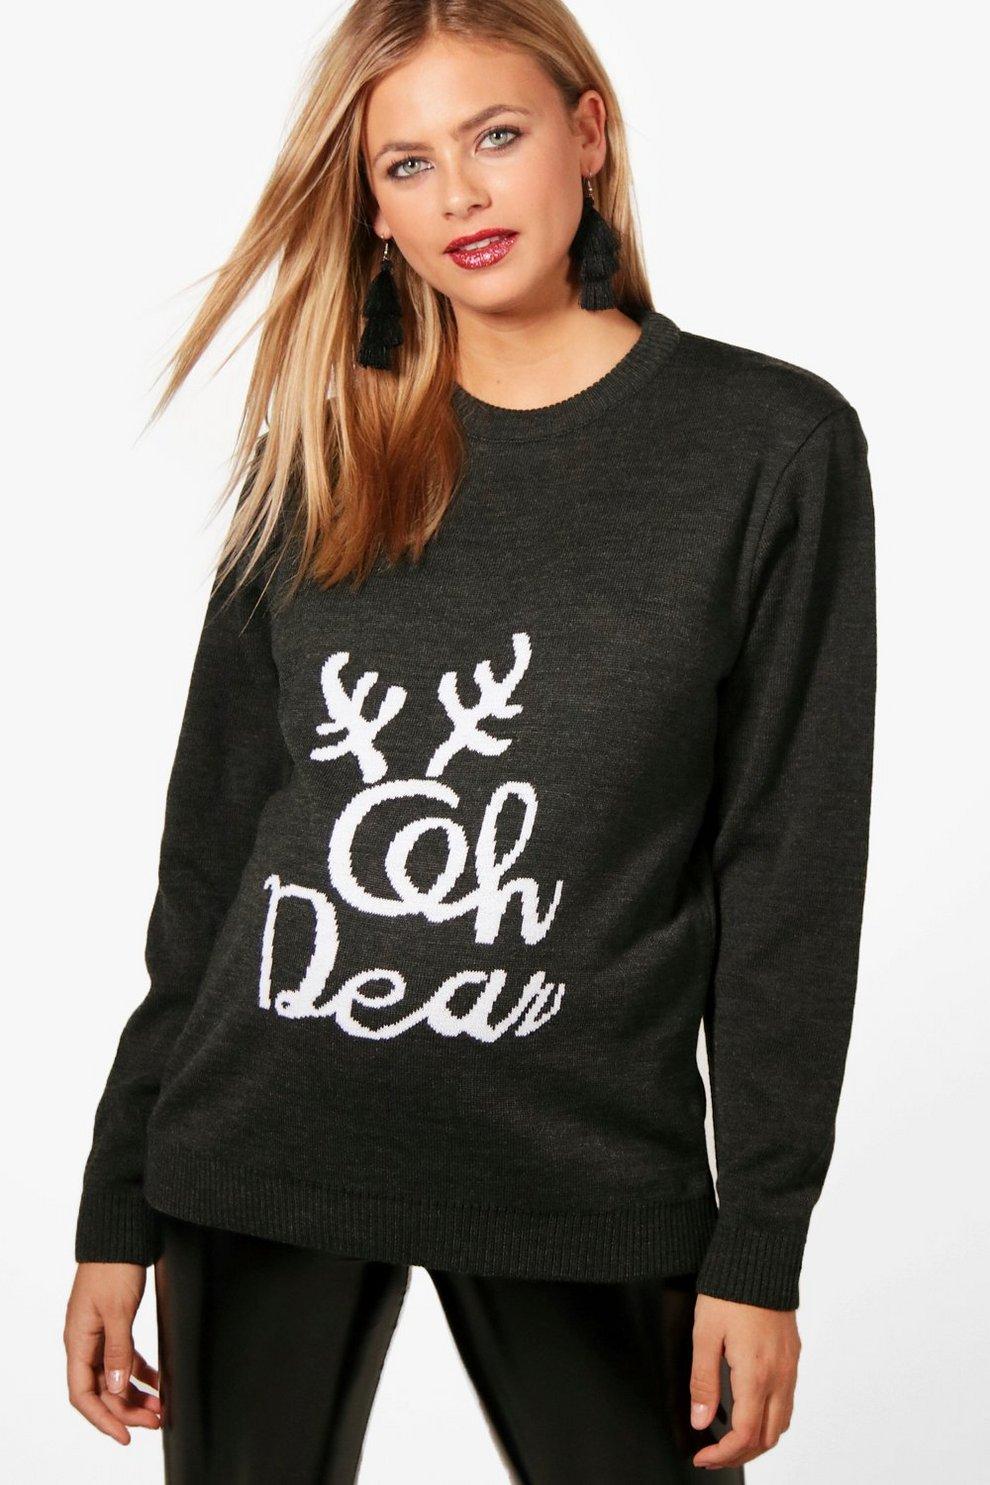 Maternity Louise Oh Deer Christmas Jumper | Boohoo